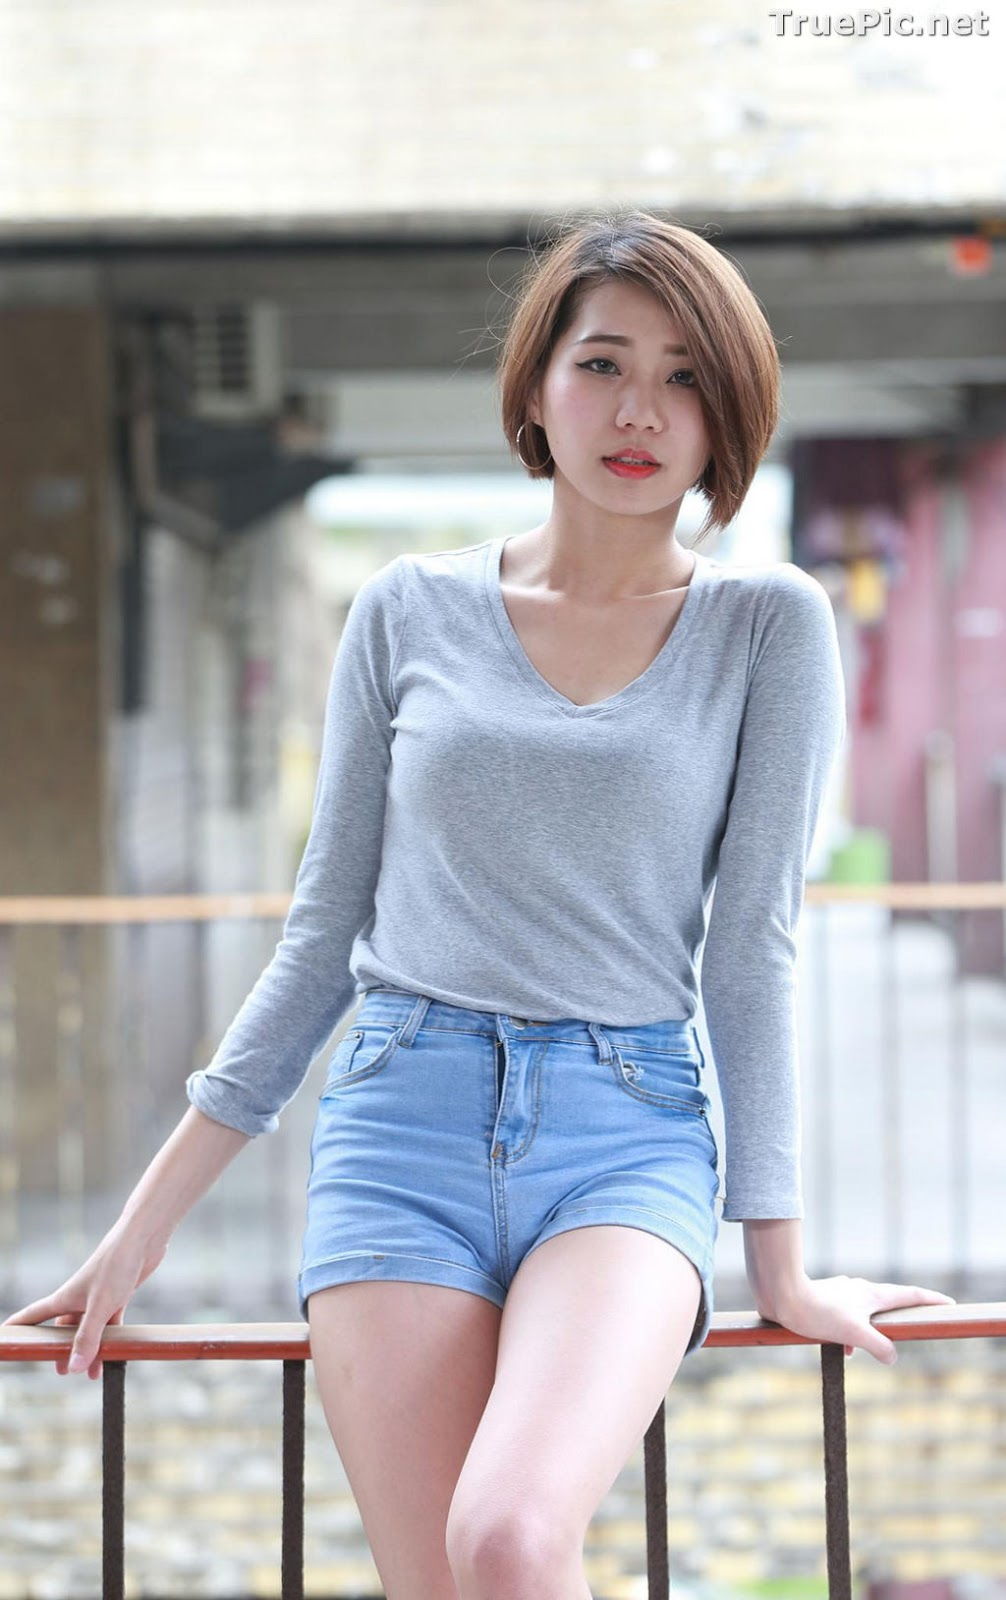 Image Pretty Taiwan Showgirl - 黃竹萱 - Beautiful Long Legs Girl - TruePic.net - Picture-8